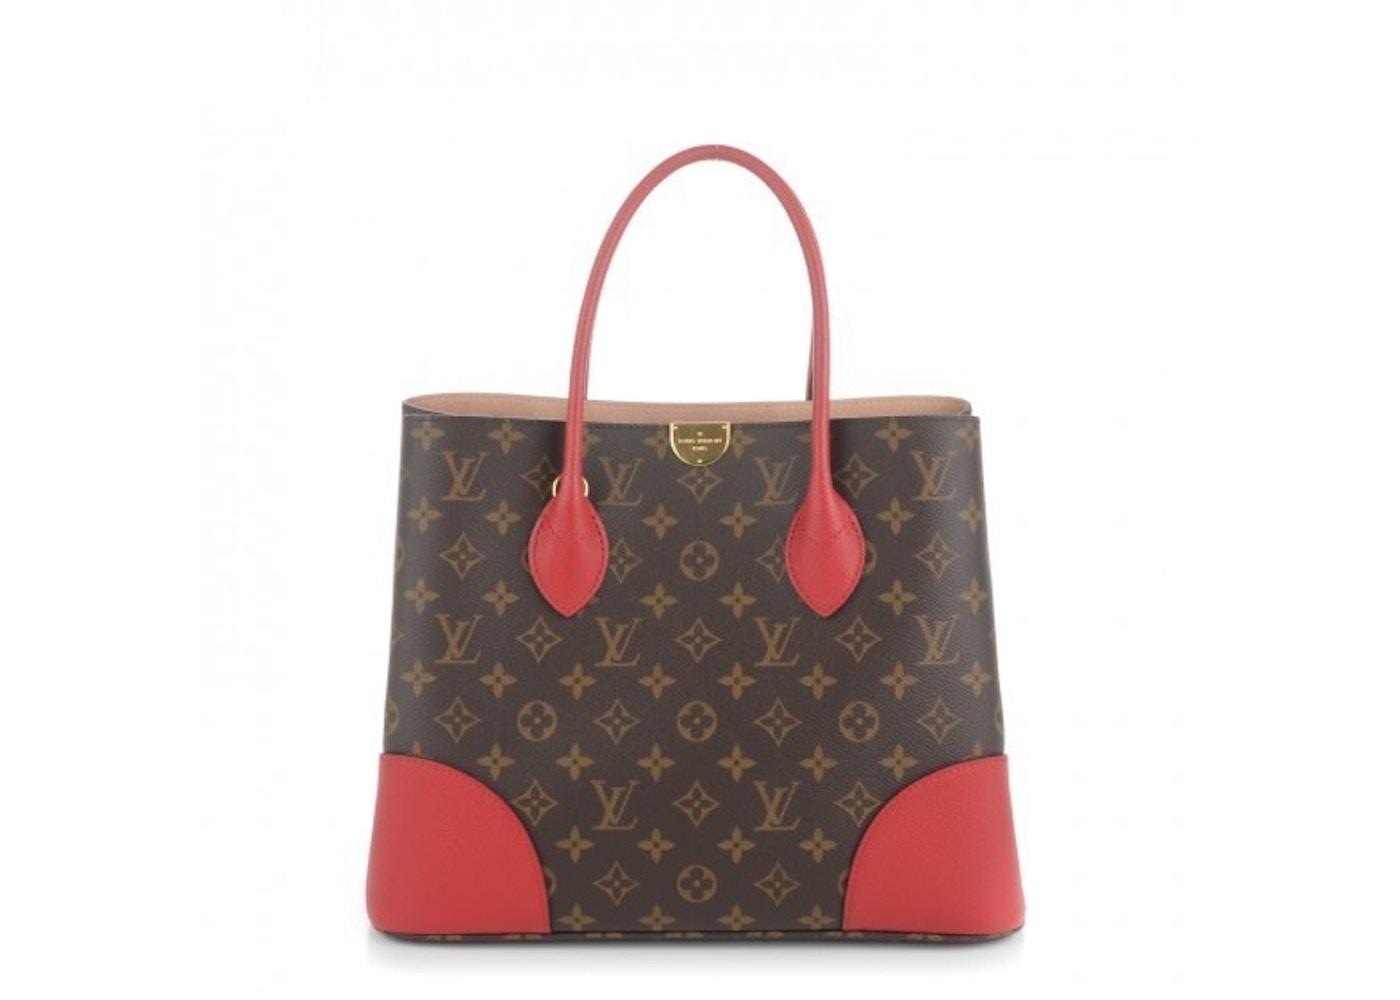 27bfc39627a Louis Vuitton Flandrin Monogram Brown, Cerise Cherry